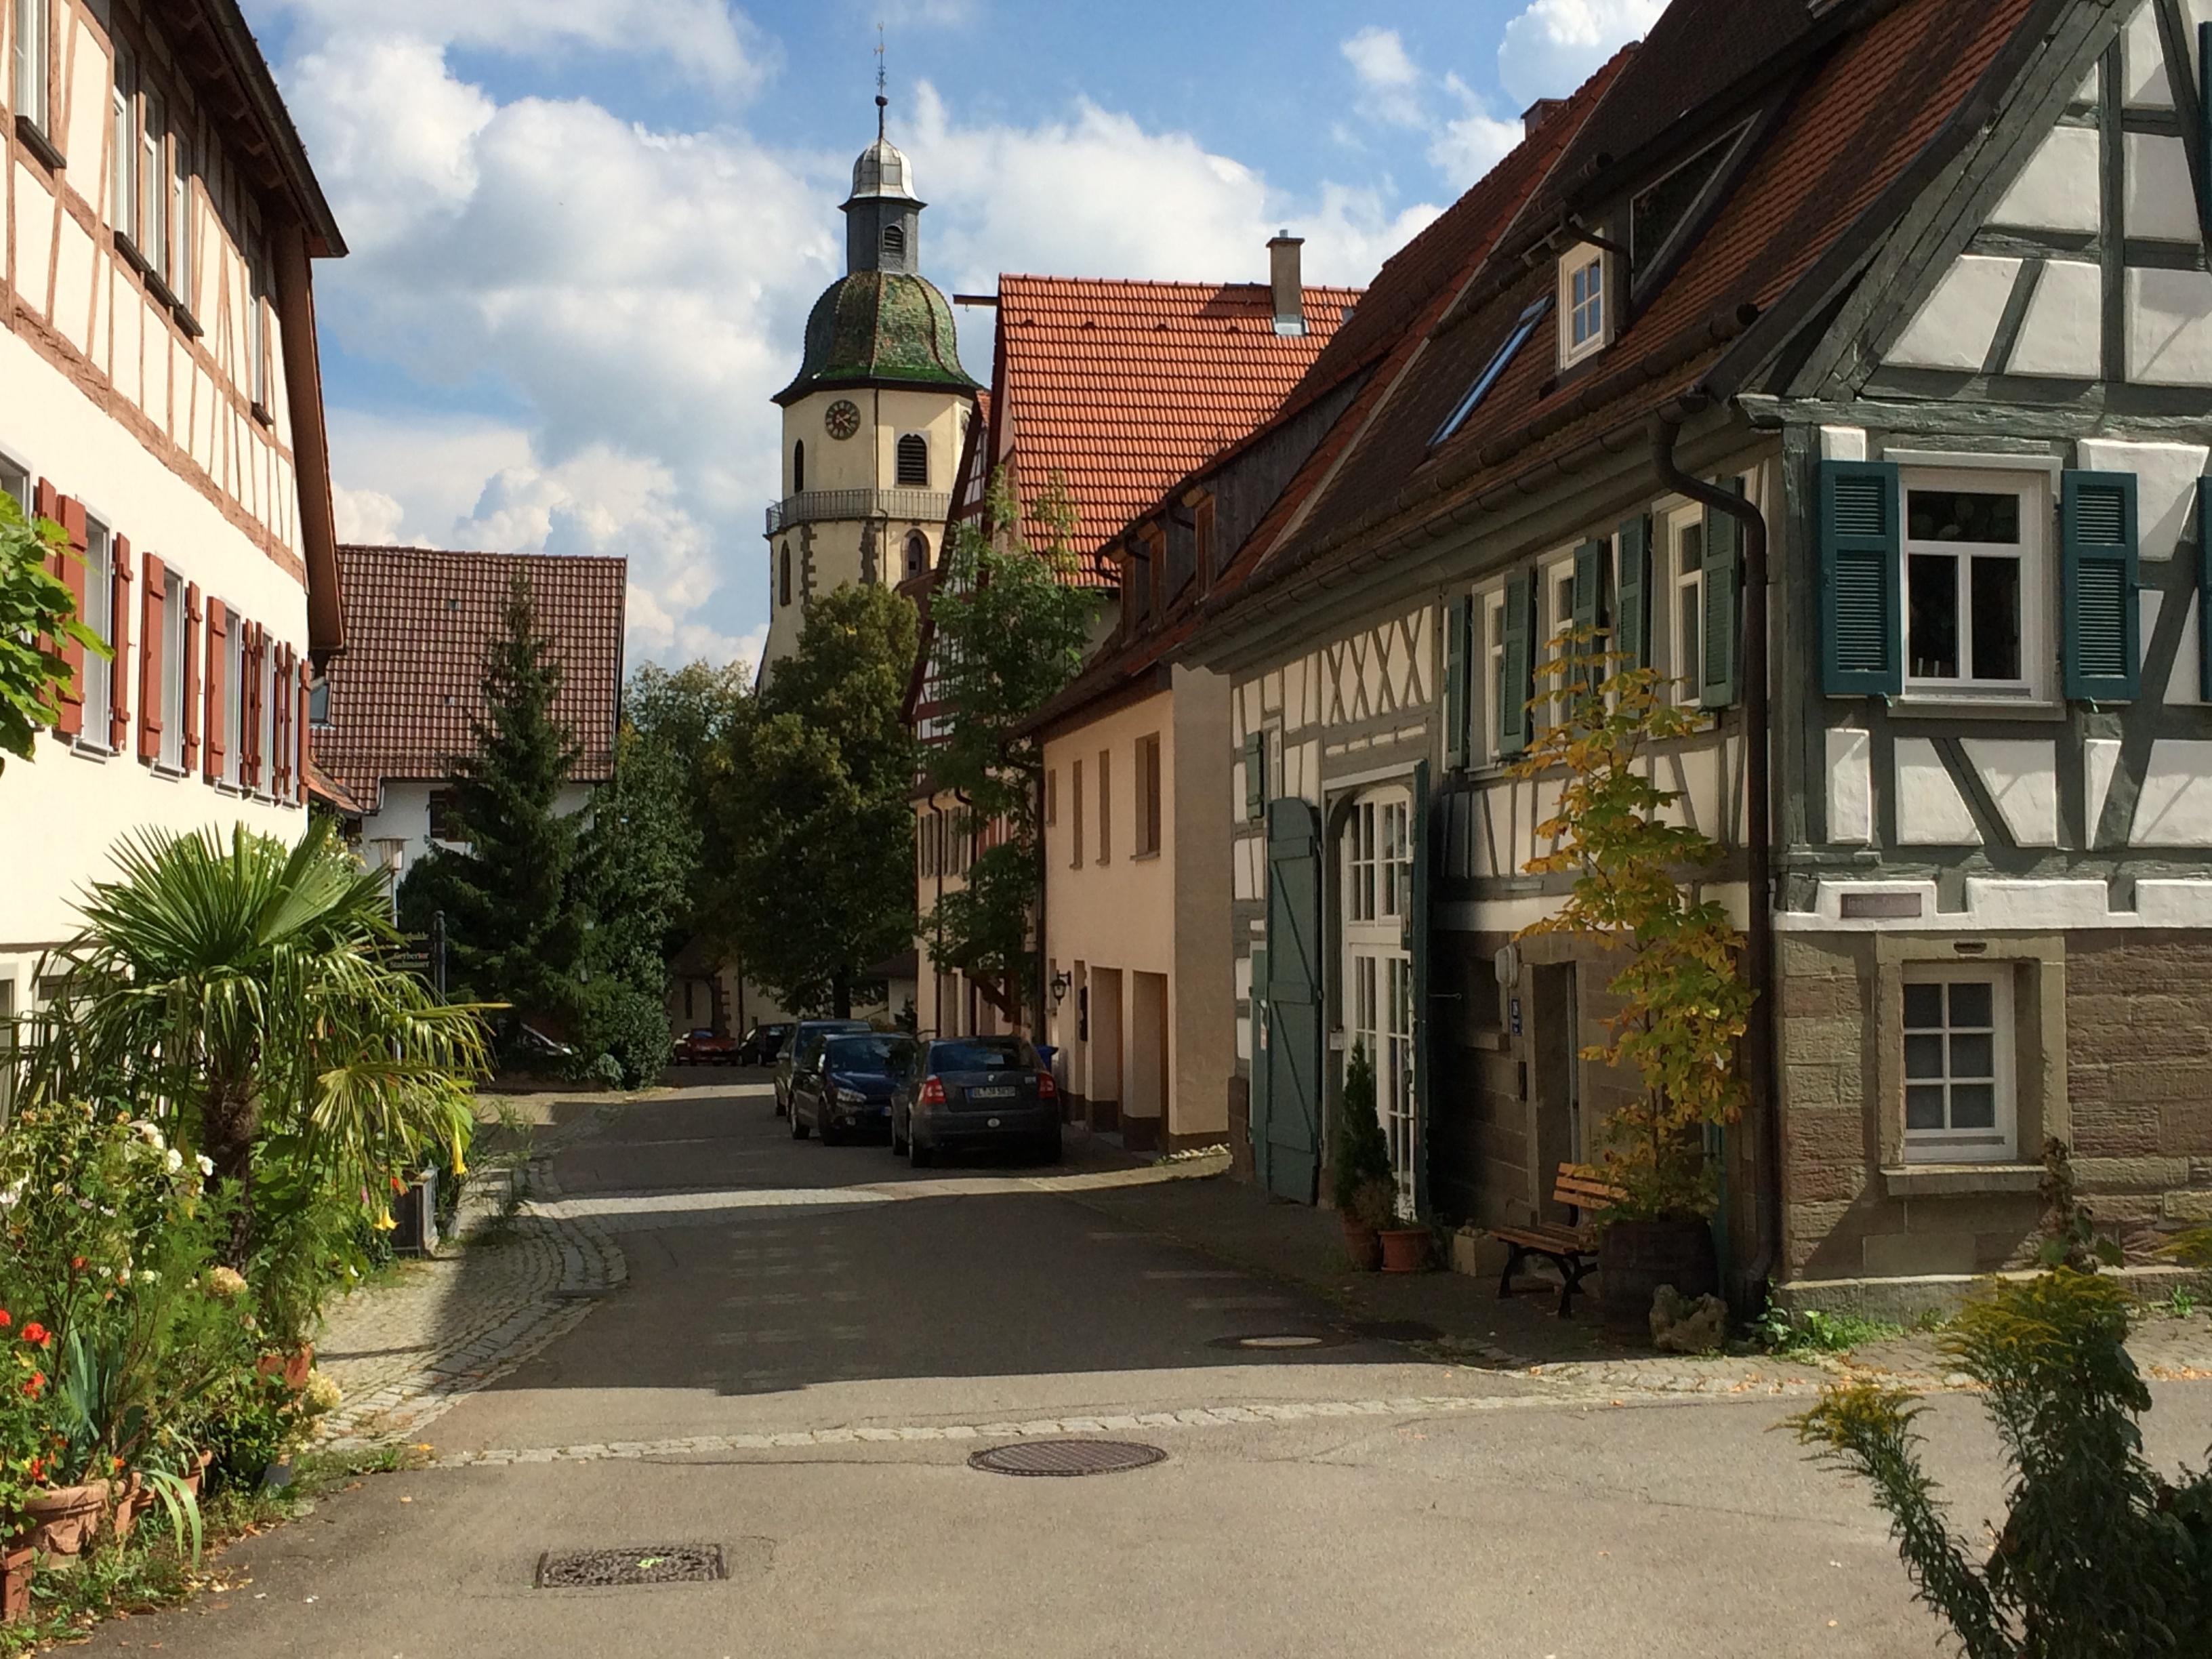 Altstadt Rosenfeld